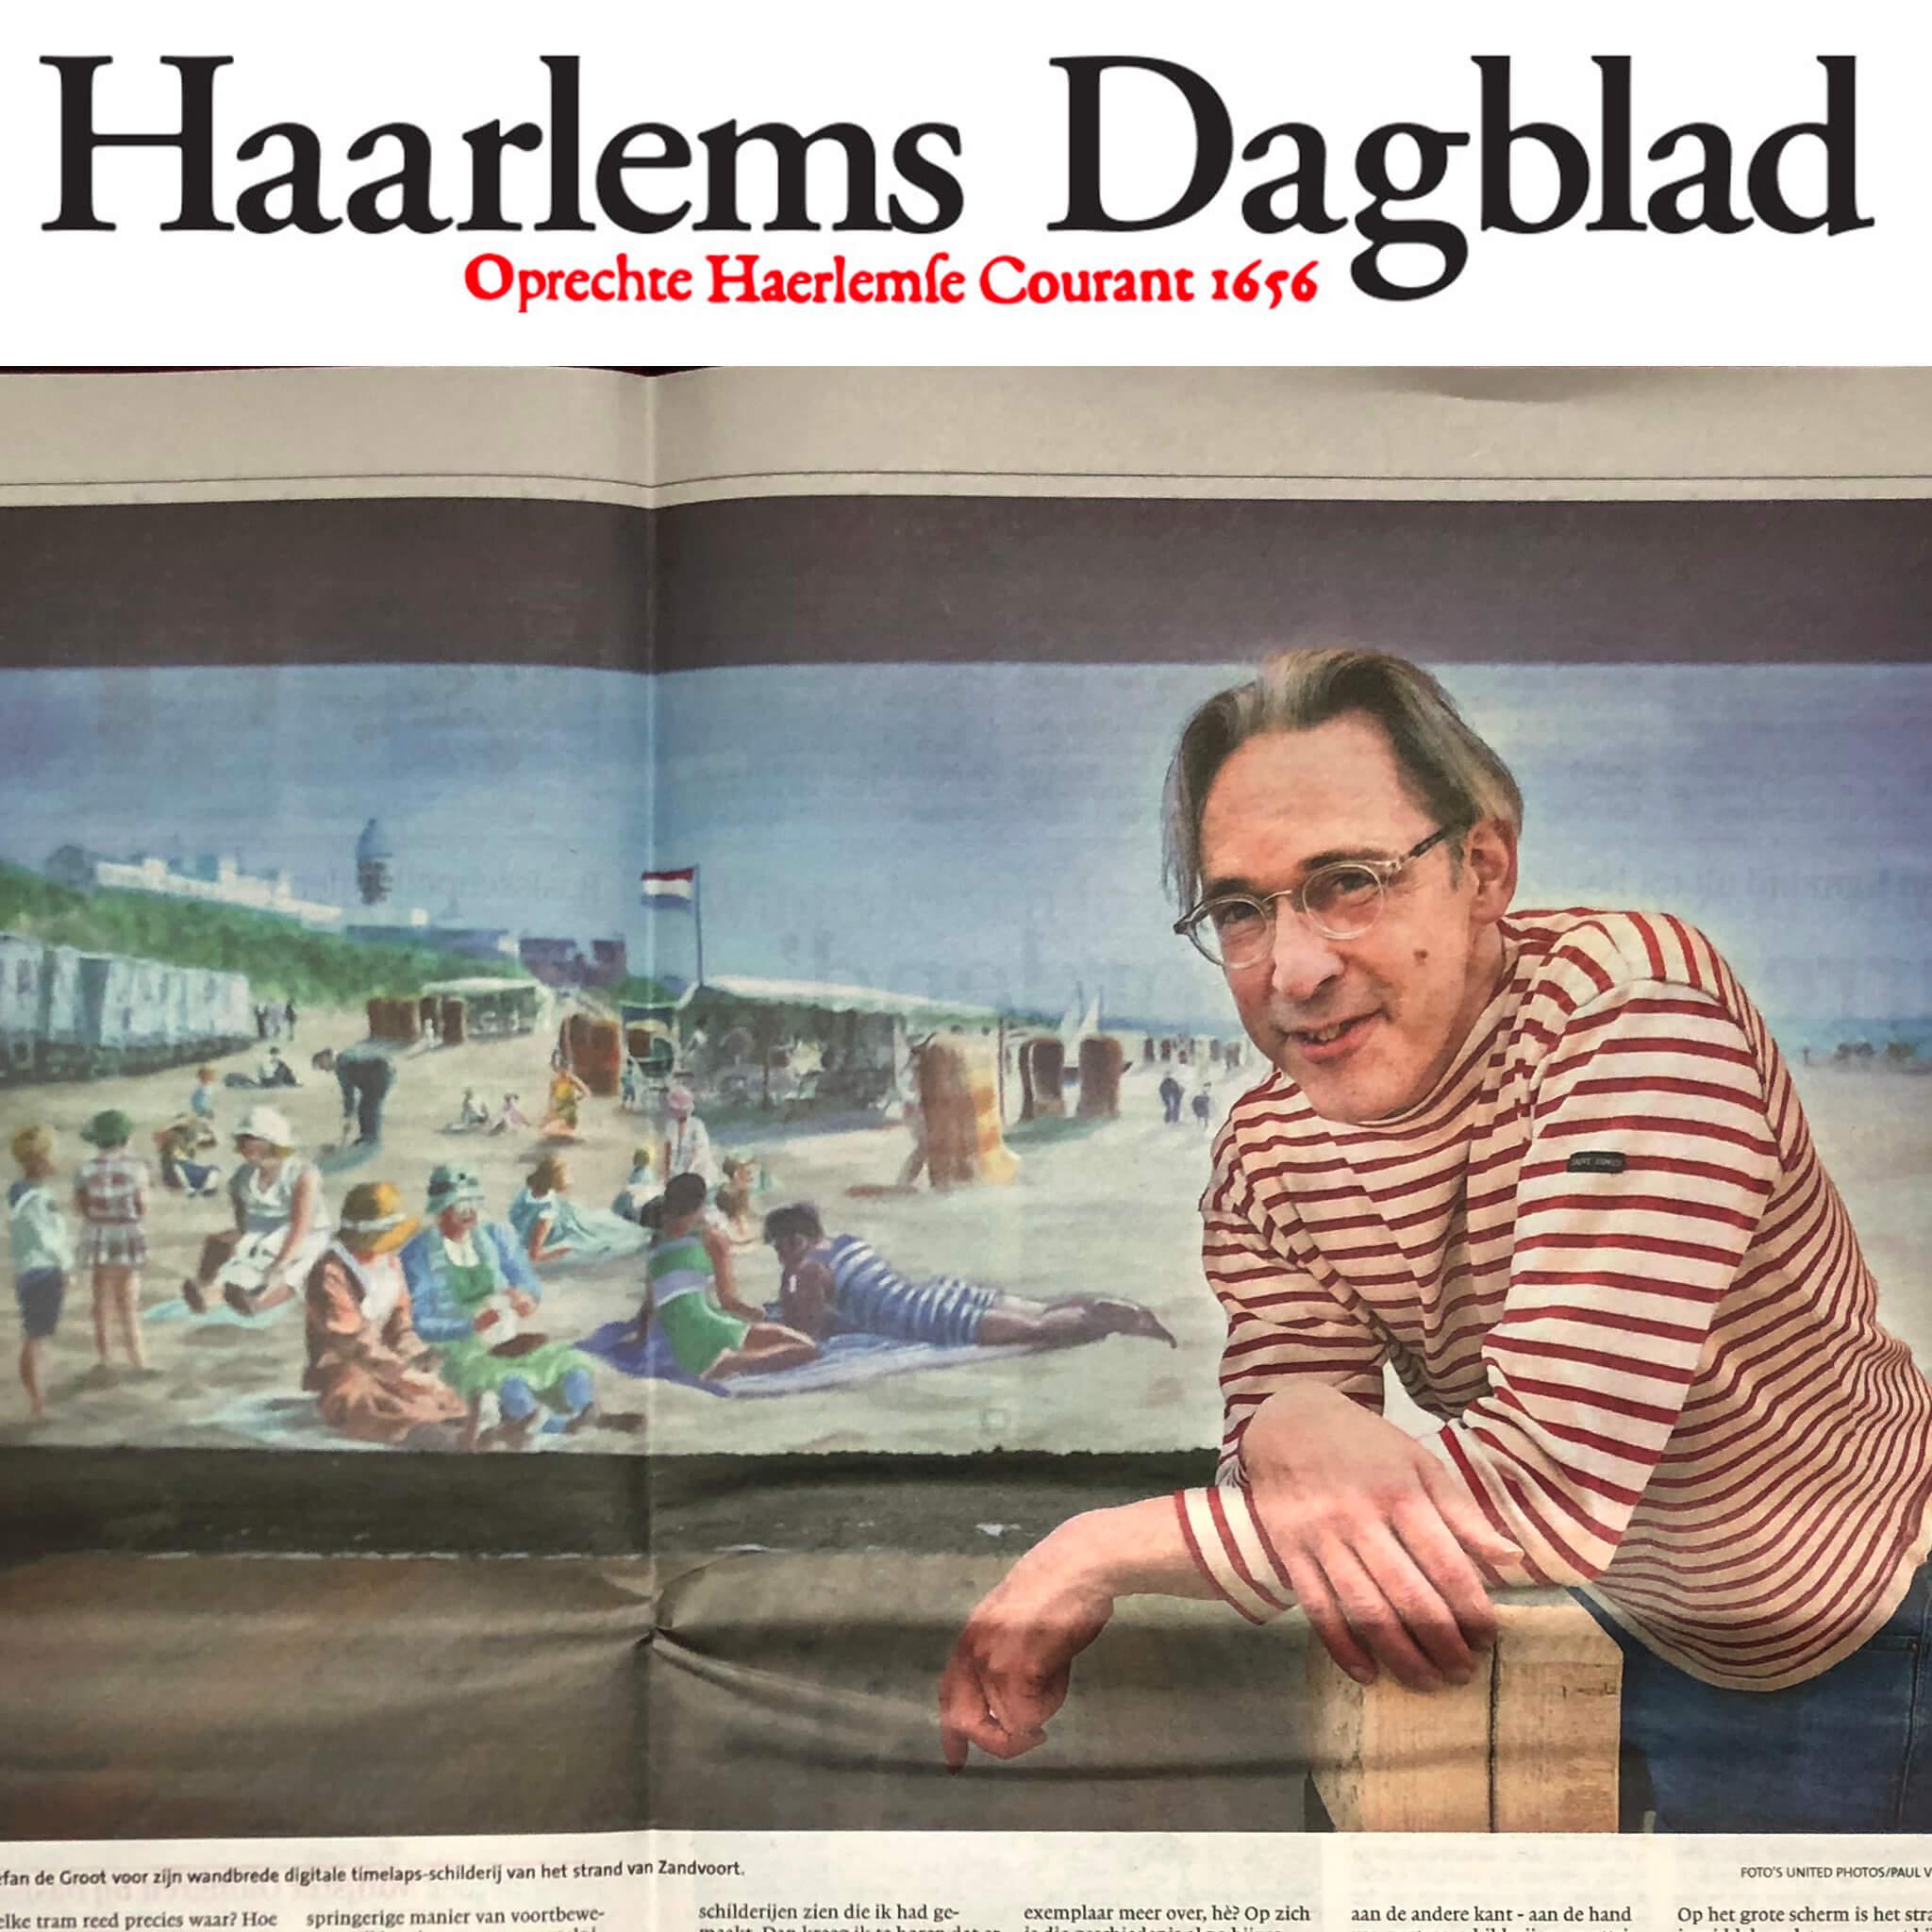 Stefan de Groot Haarlems Dagblad